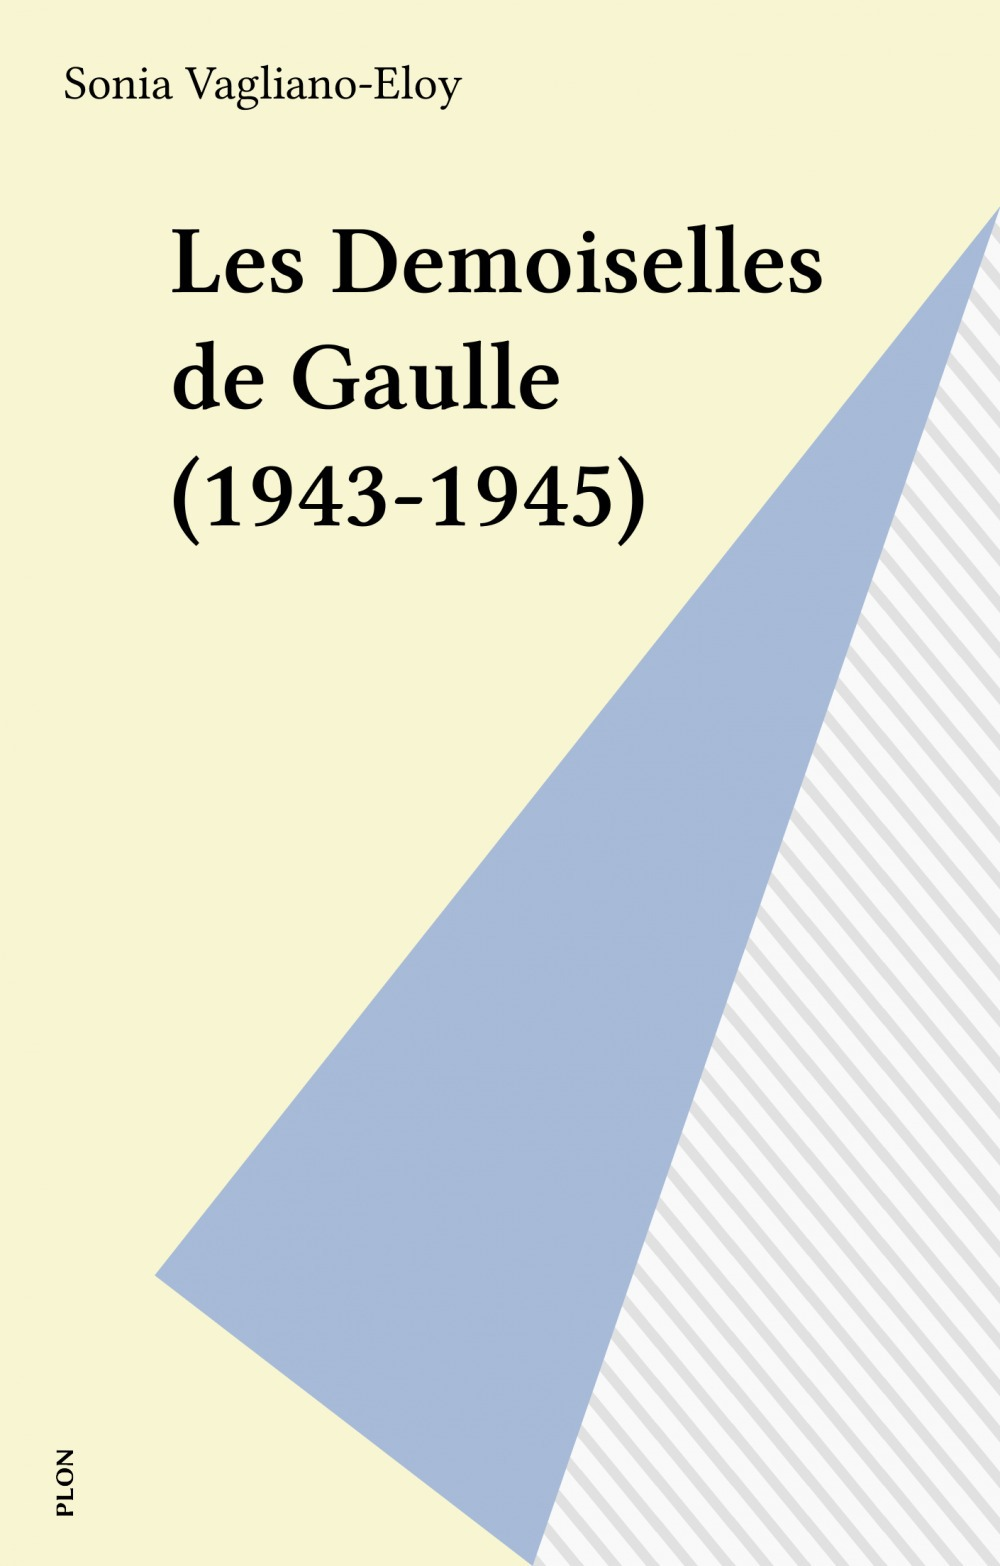 Les Demoiselles de Gaulle (1943-1945)  - Vagliano-Eloy  - Sonia Vagliano-Eloy